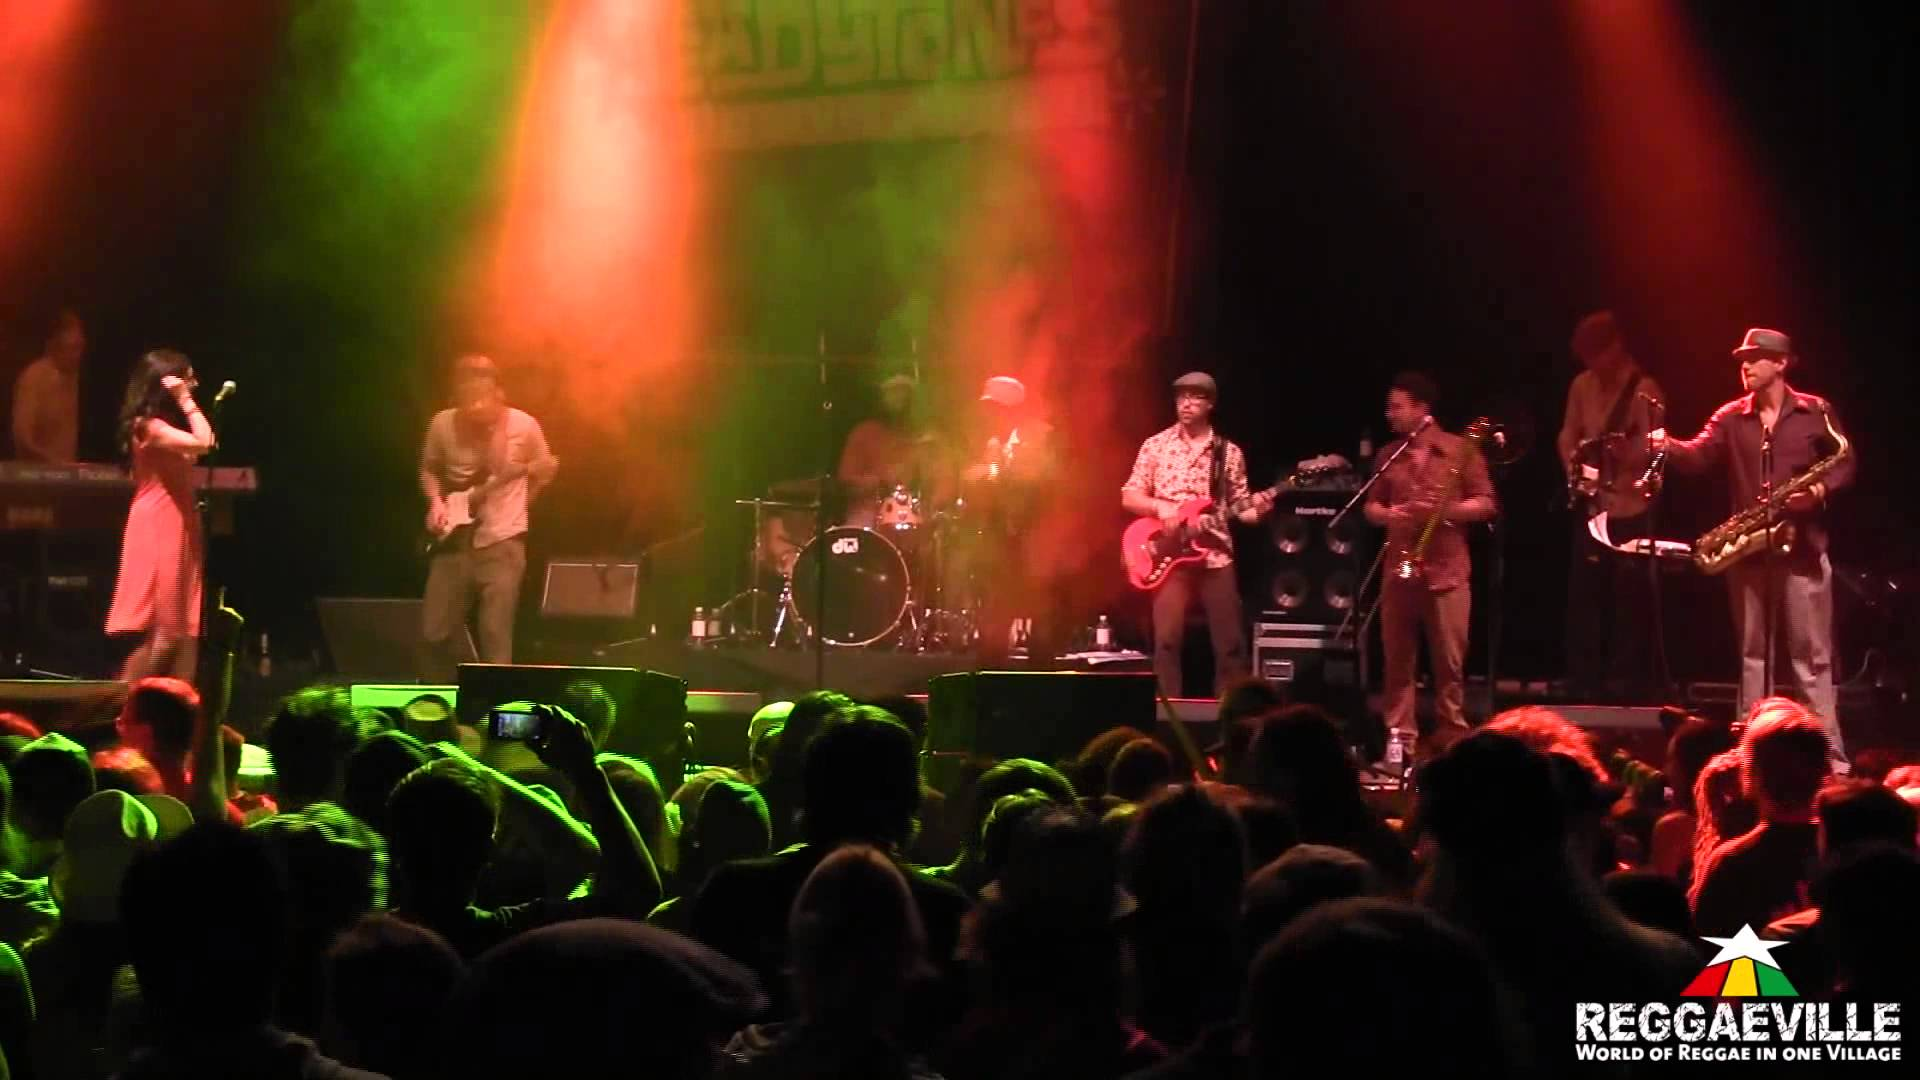 Stranger Cole & The Steadytones @ Chiemsee Reggae Summer 2013 [8/23/2013]